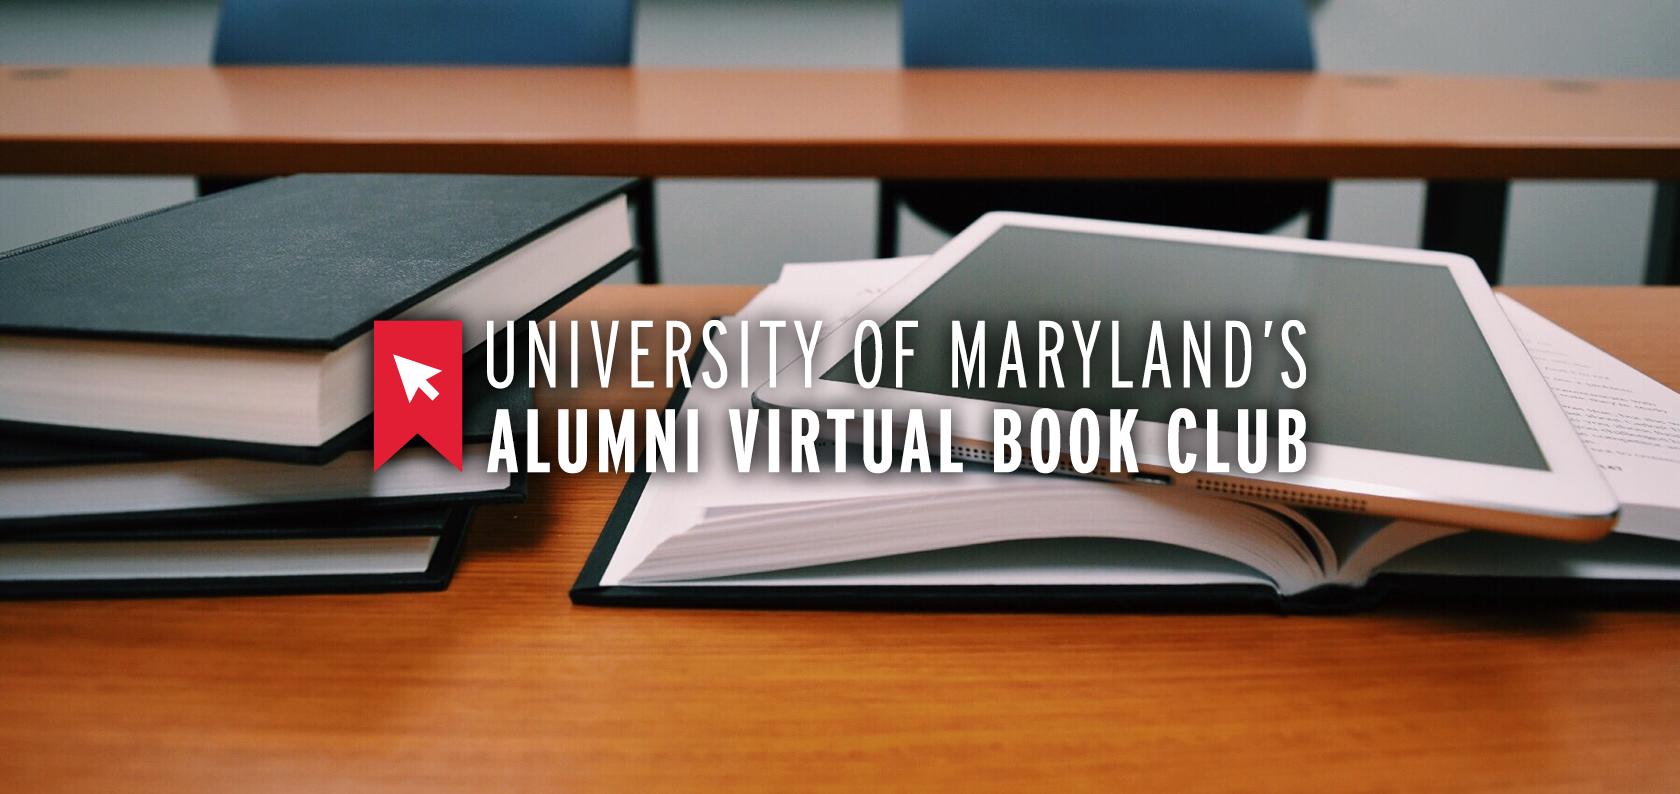 University of Maryland Alumni Virtual Book Club